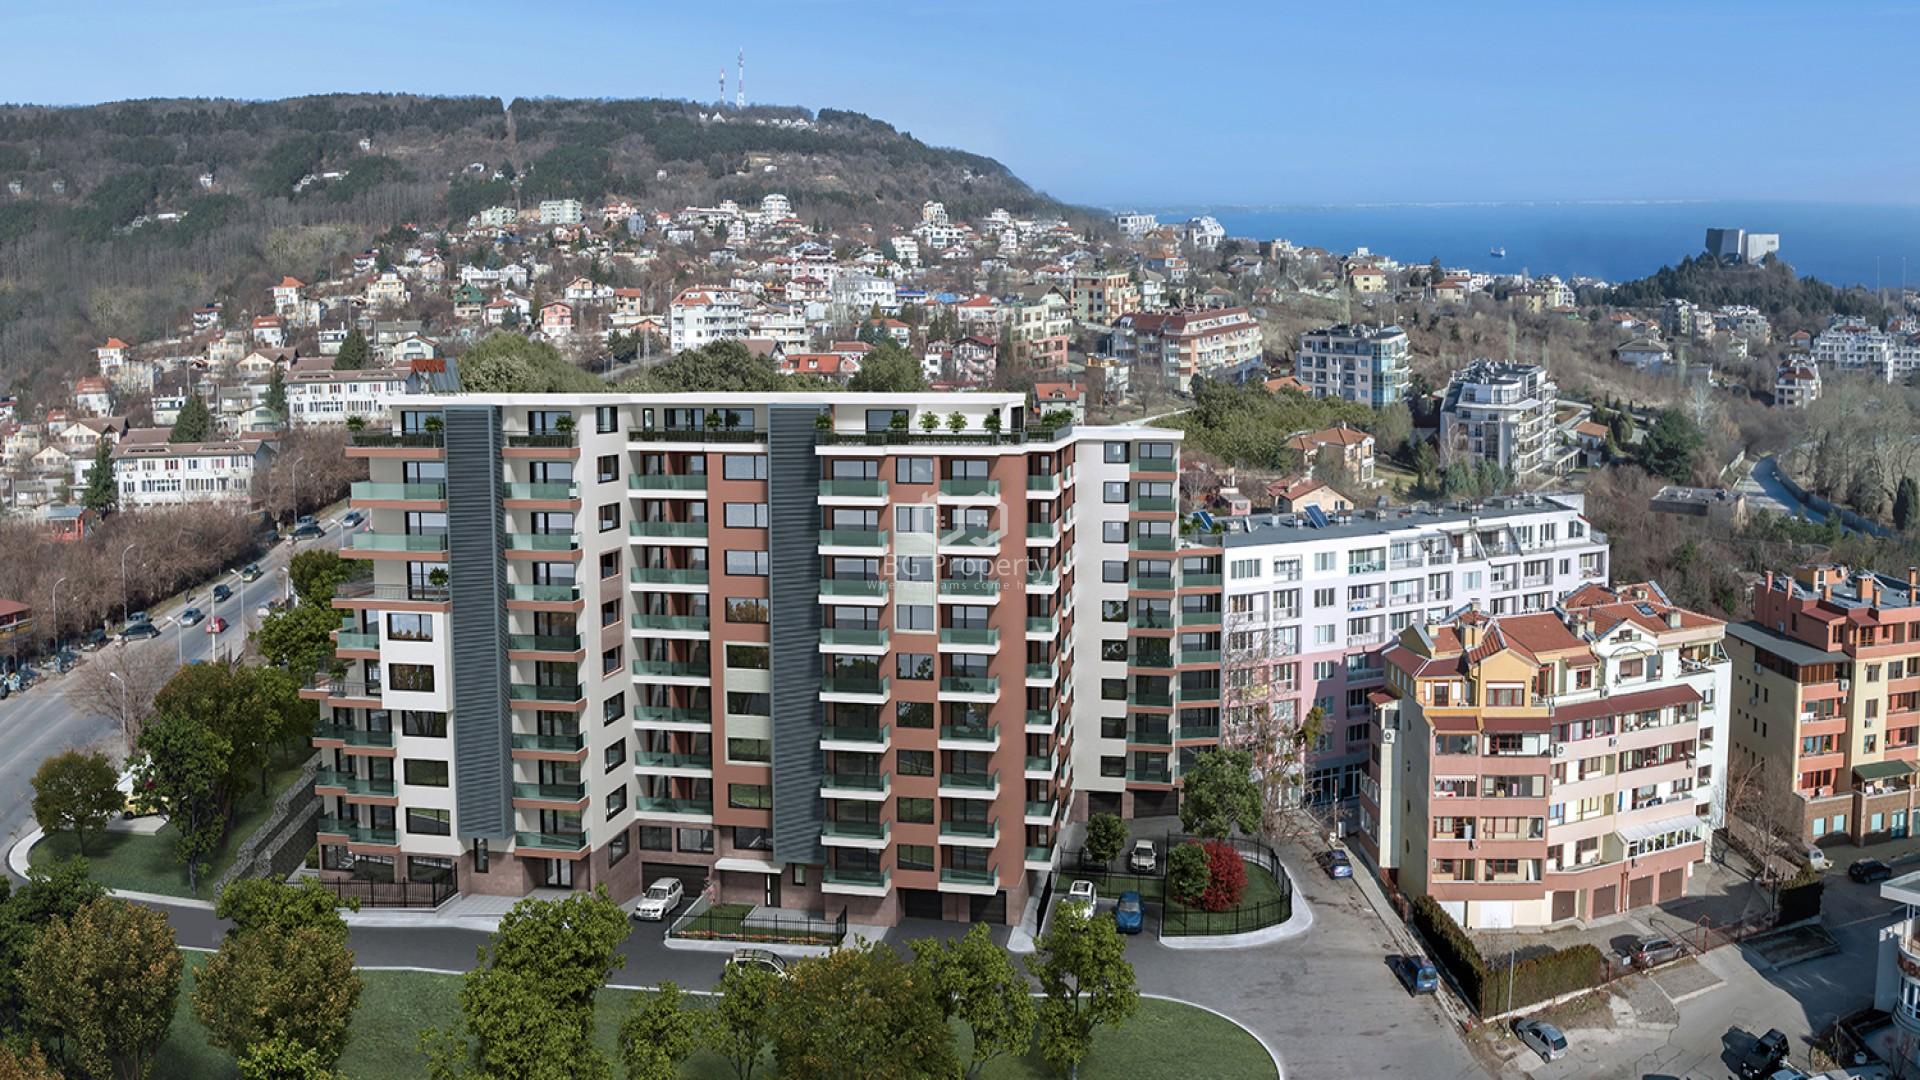 Two bedroom apartment briz Varna 90 m2